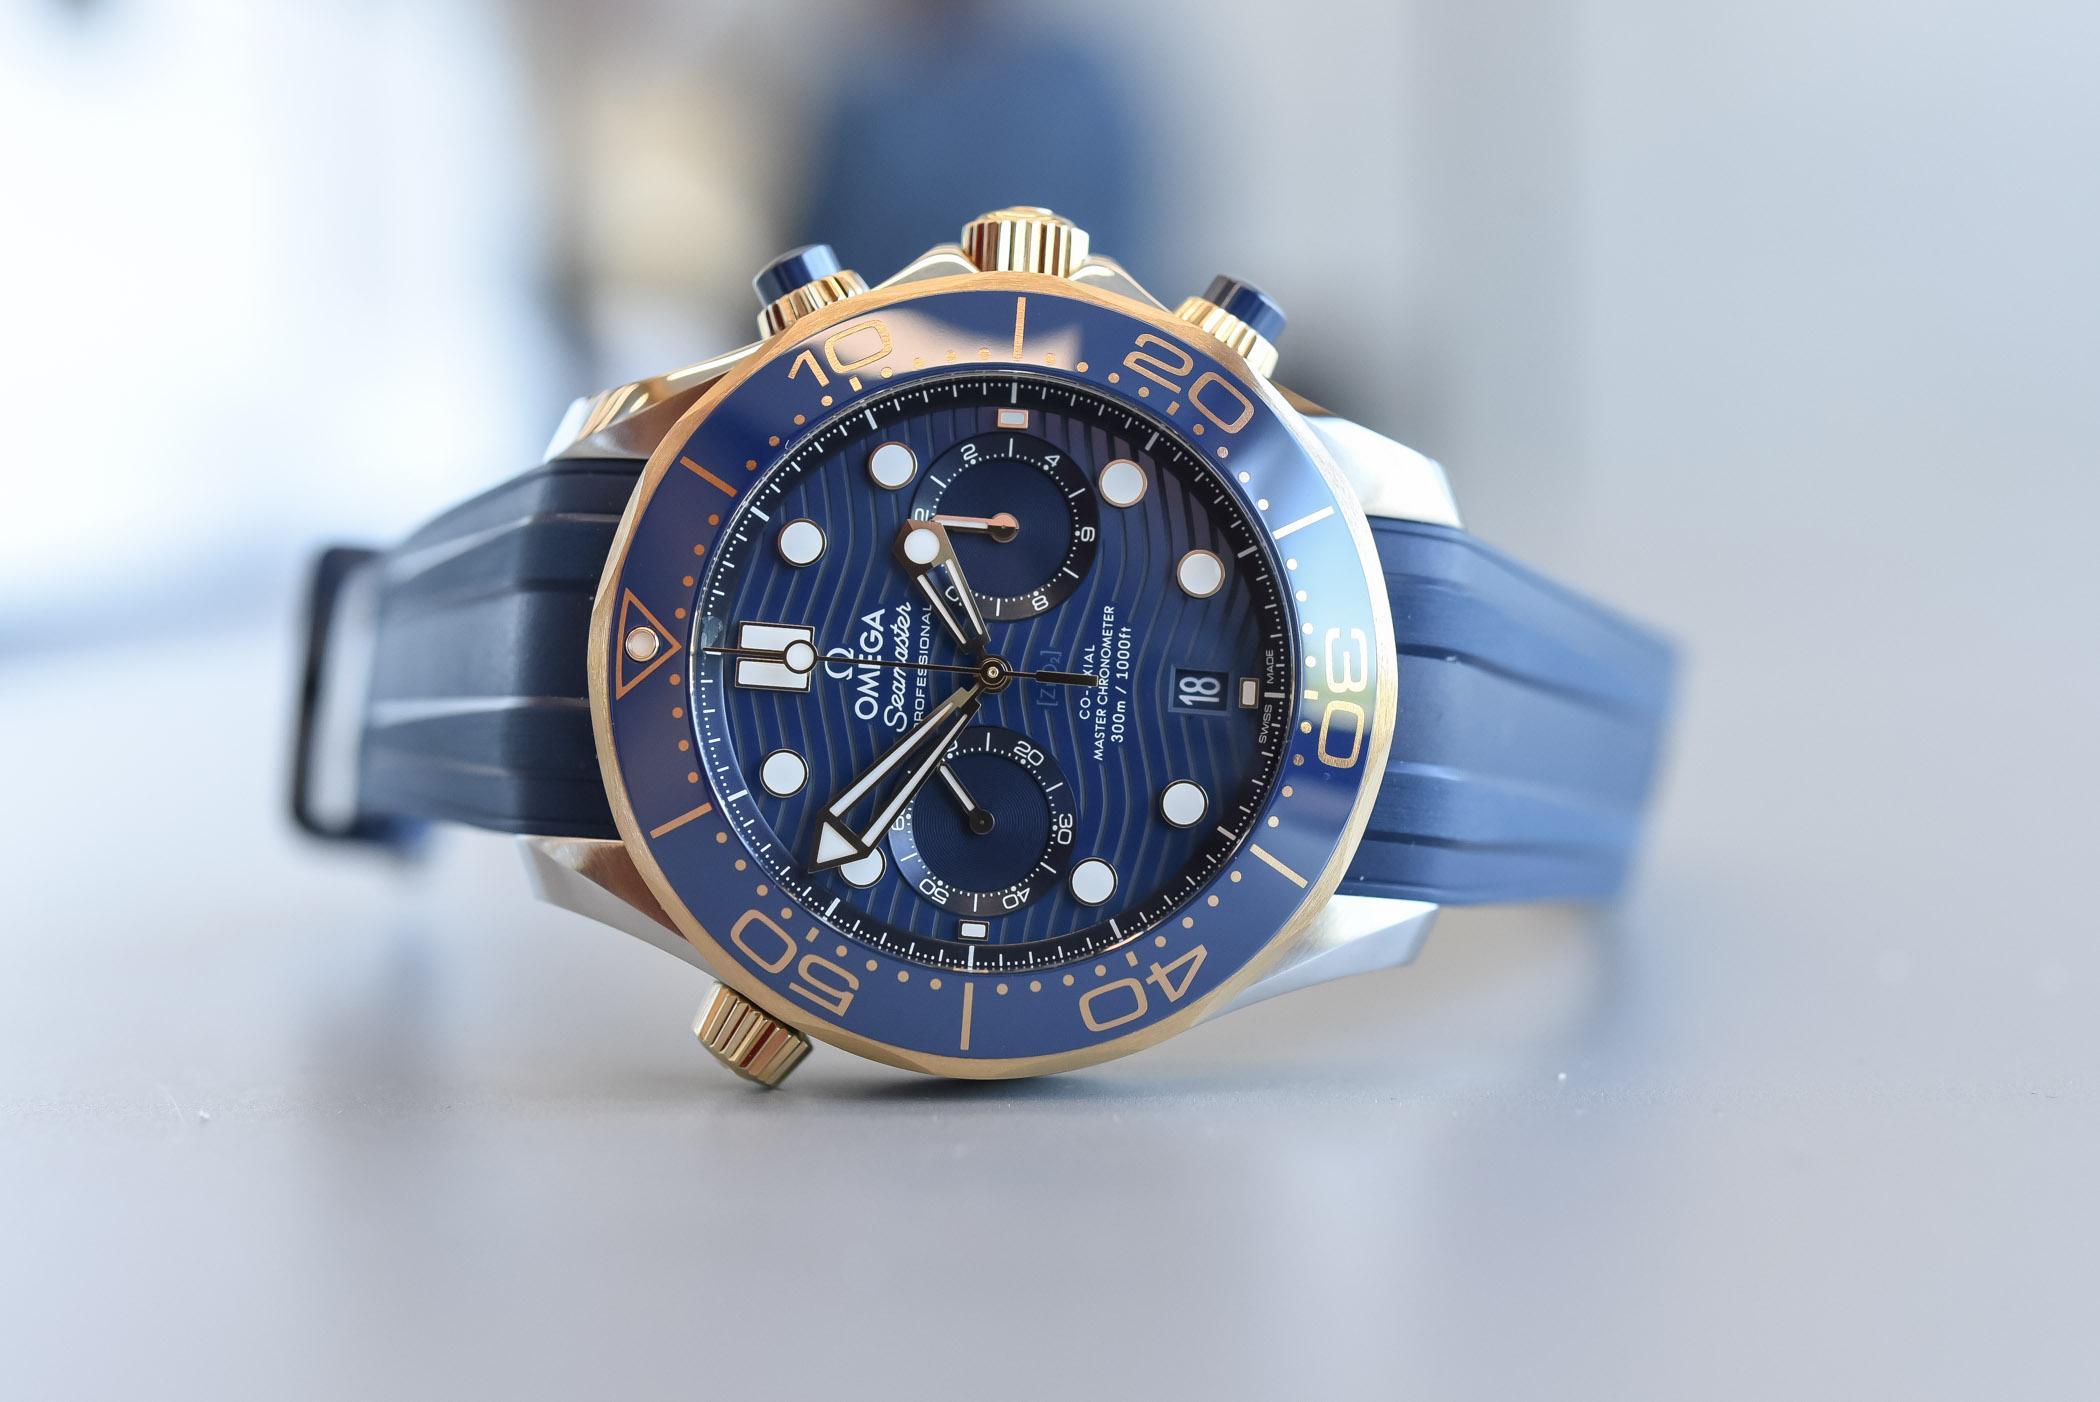 Omega Seamaster Diver 300M Chronograph Master Chronometer 2019